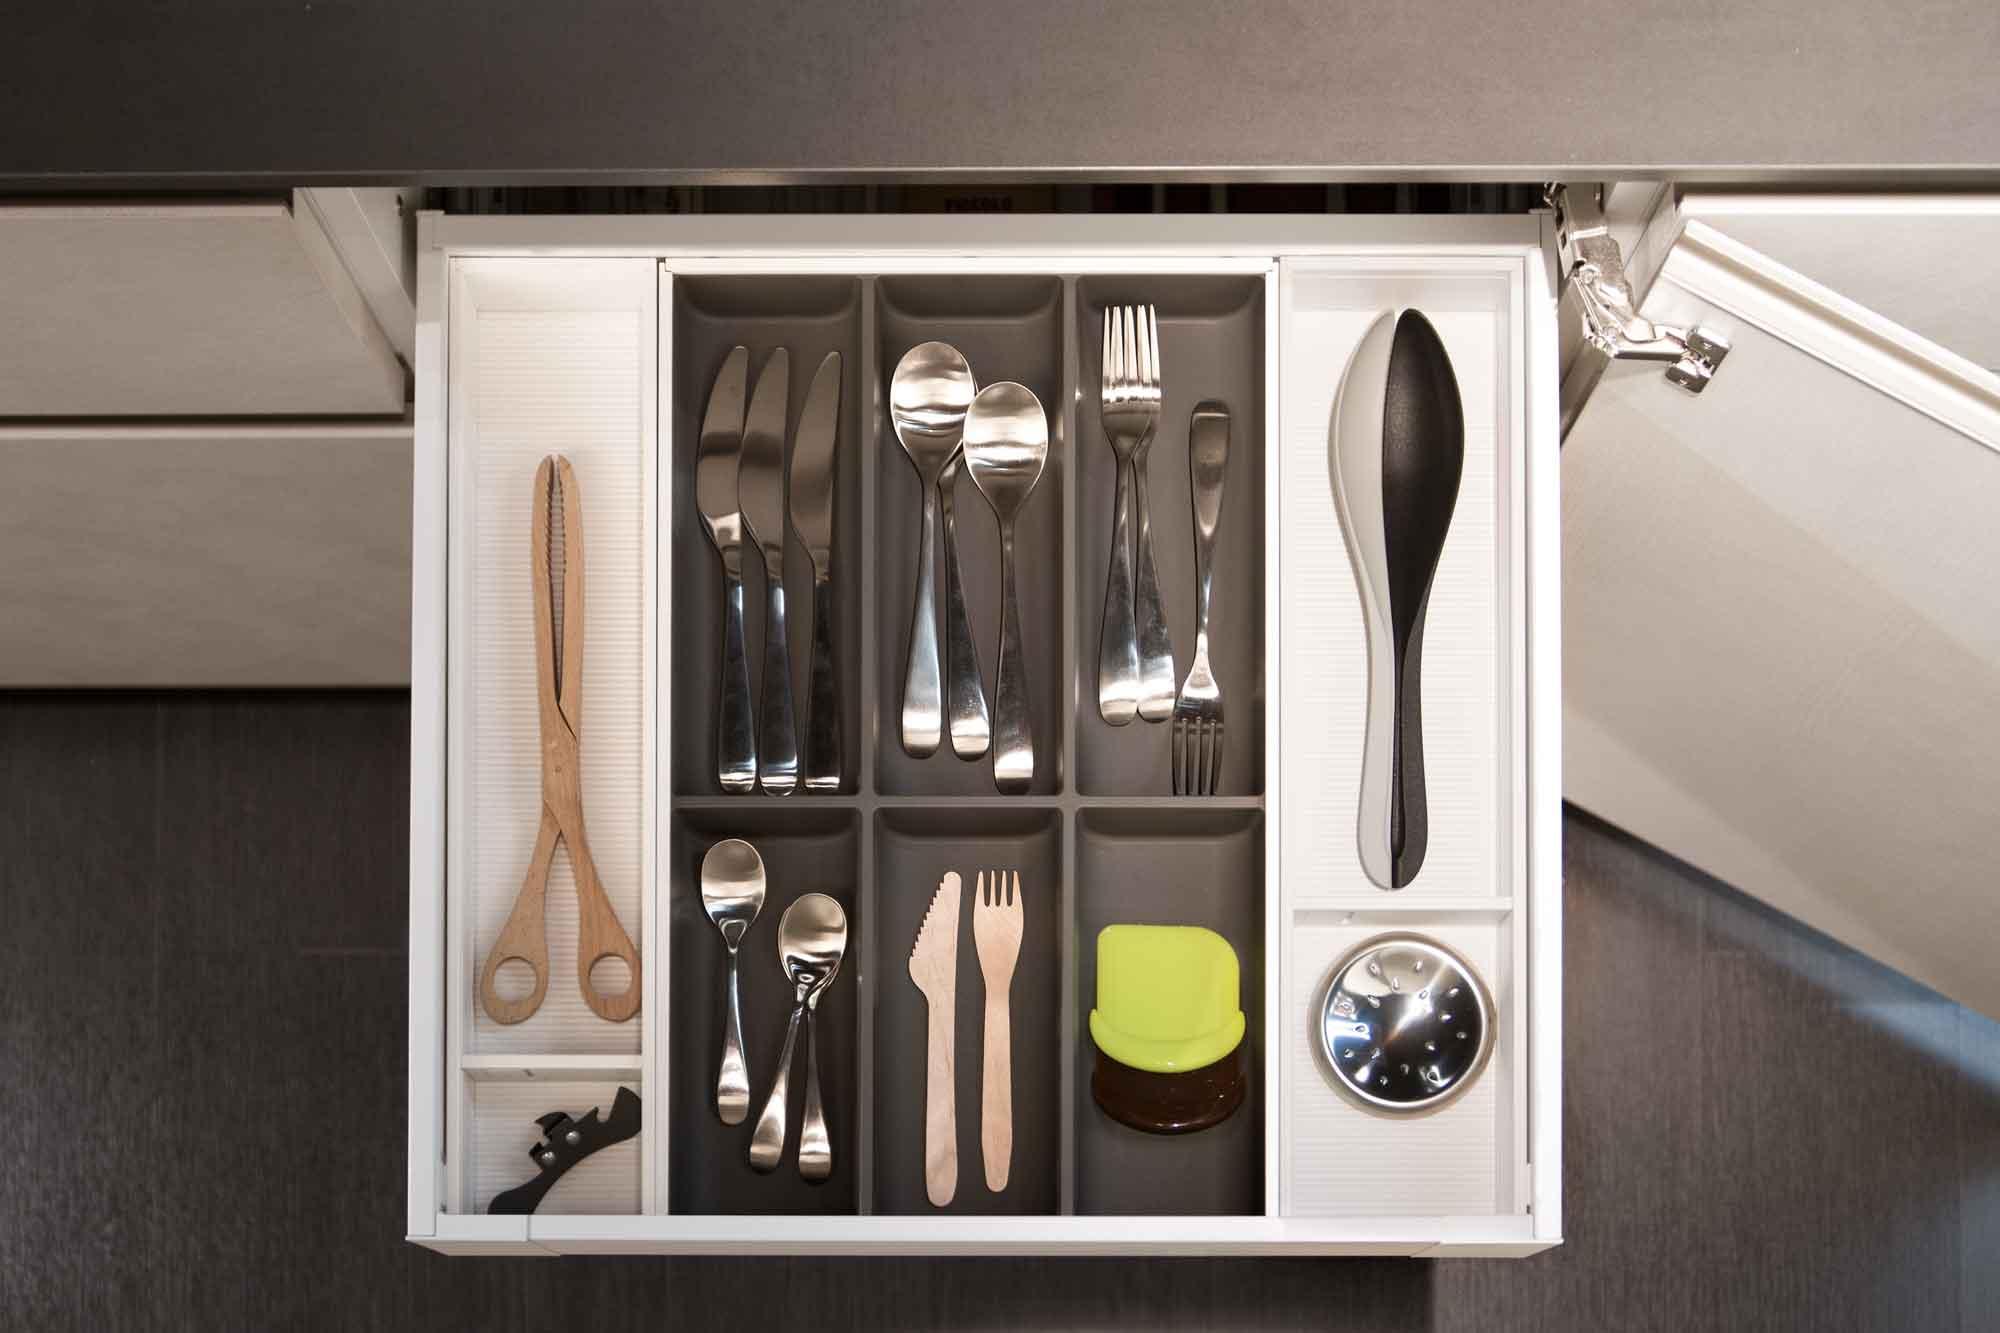 Cucina_moderna_cassetto_portaposate